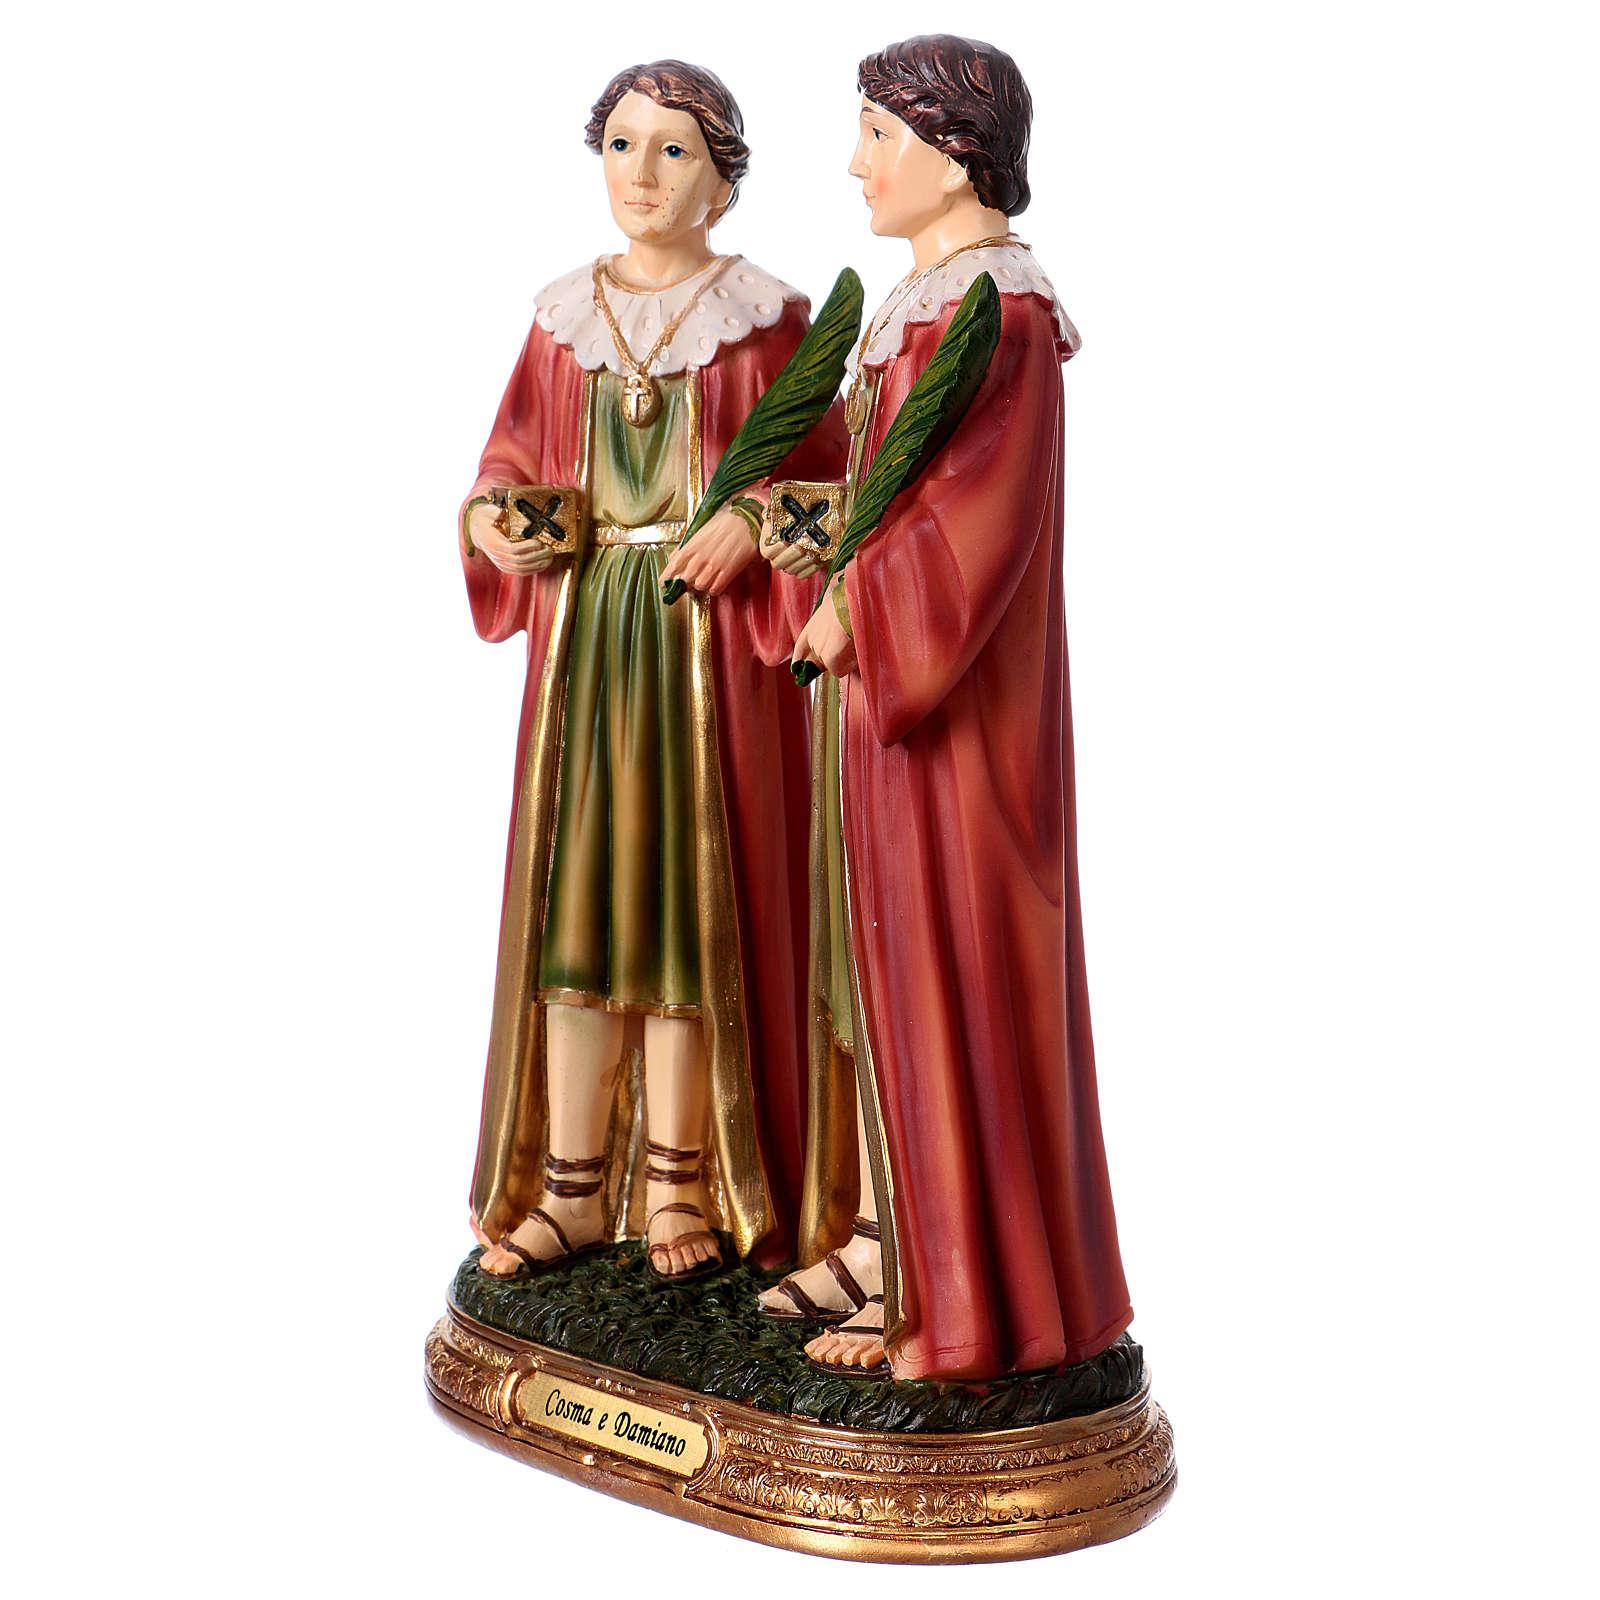 Cosma e Damiano statua 20 cm resina 4